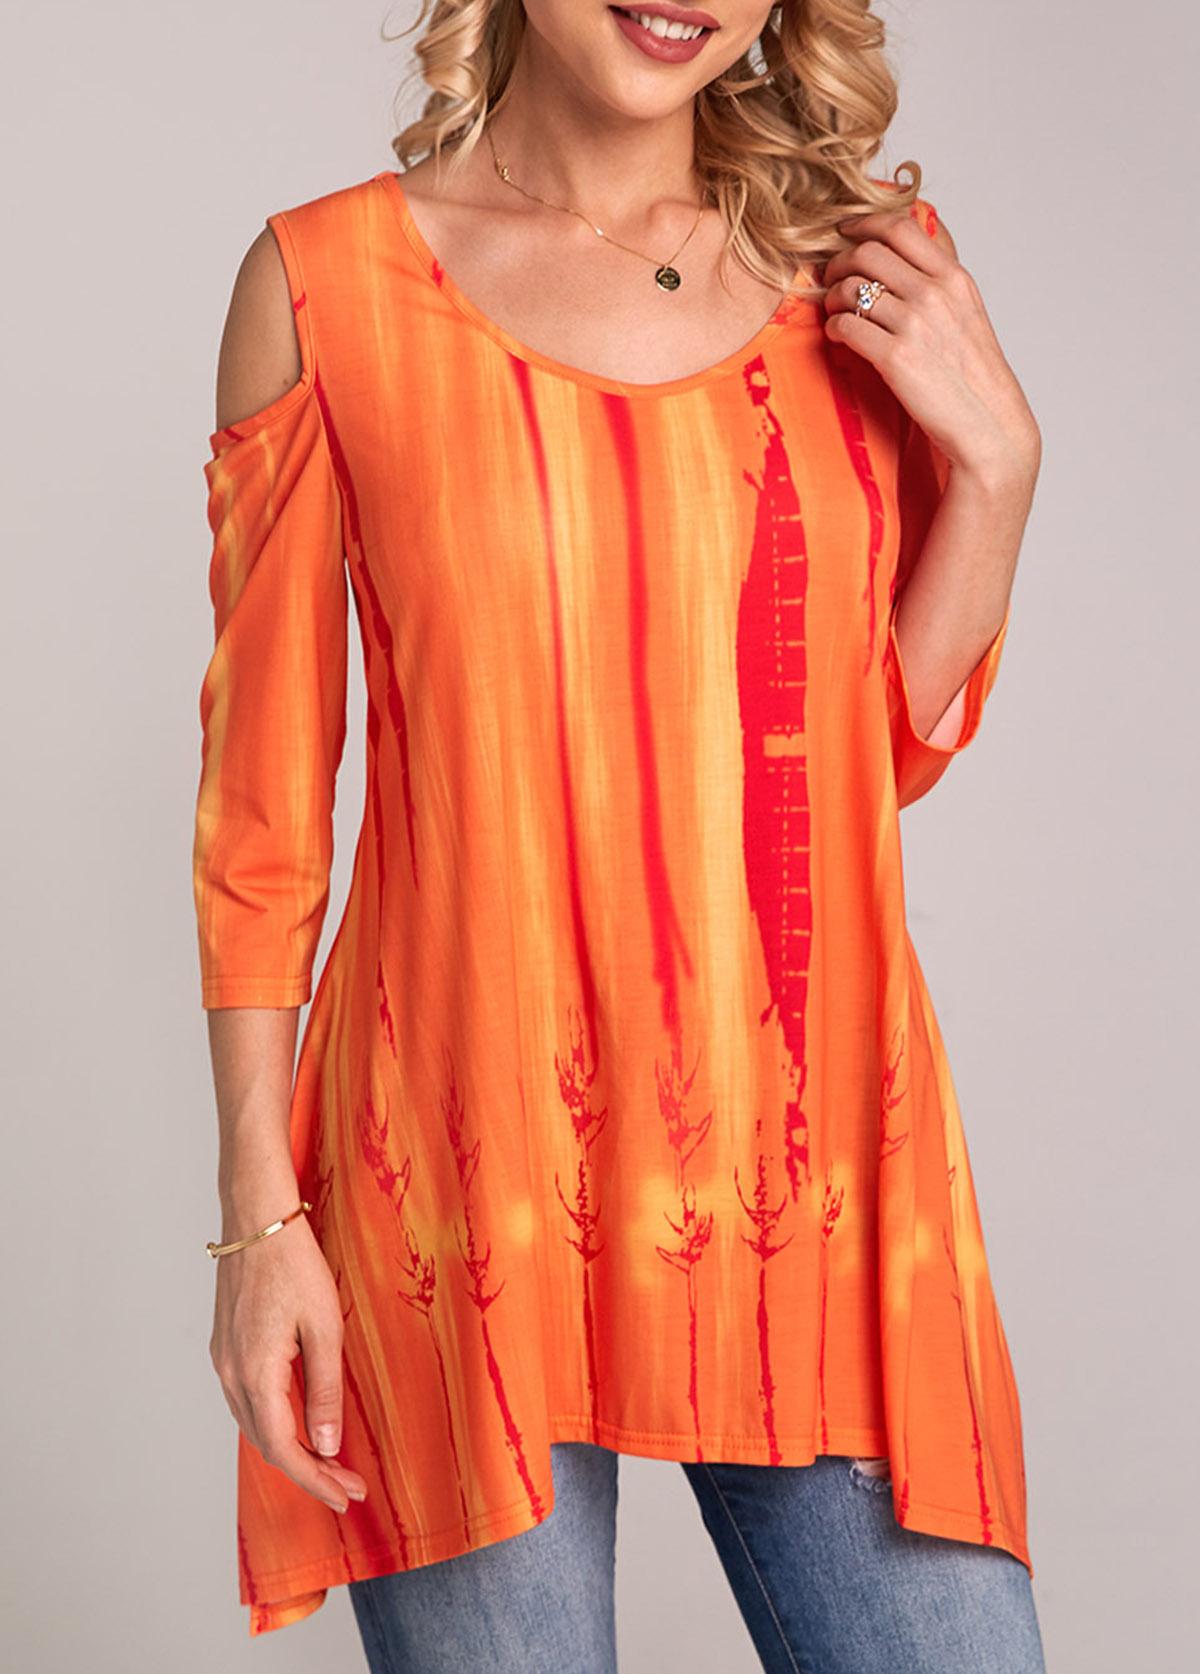 Cold Shoulder Tie Dye Print Orange T Shirt